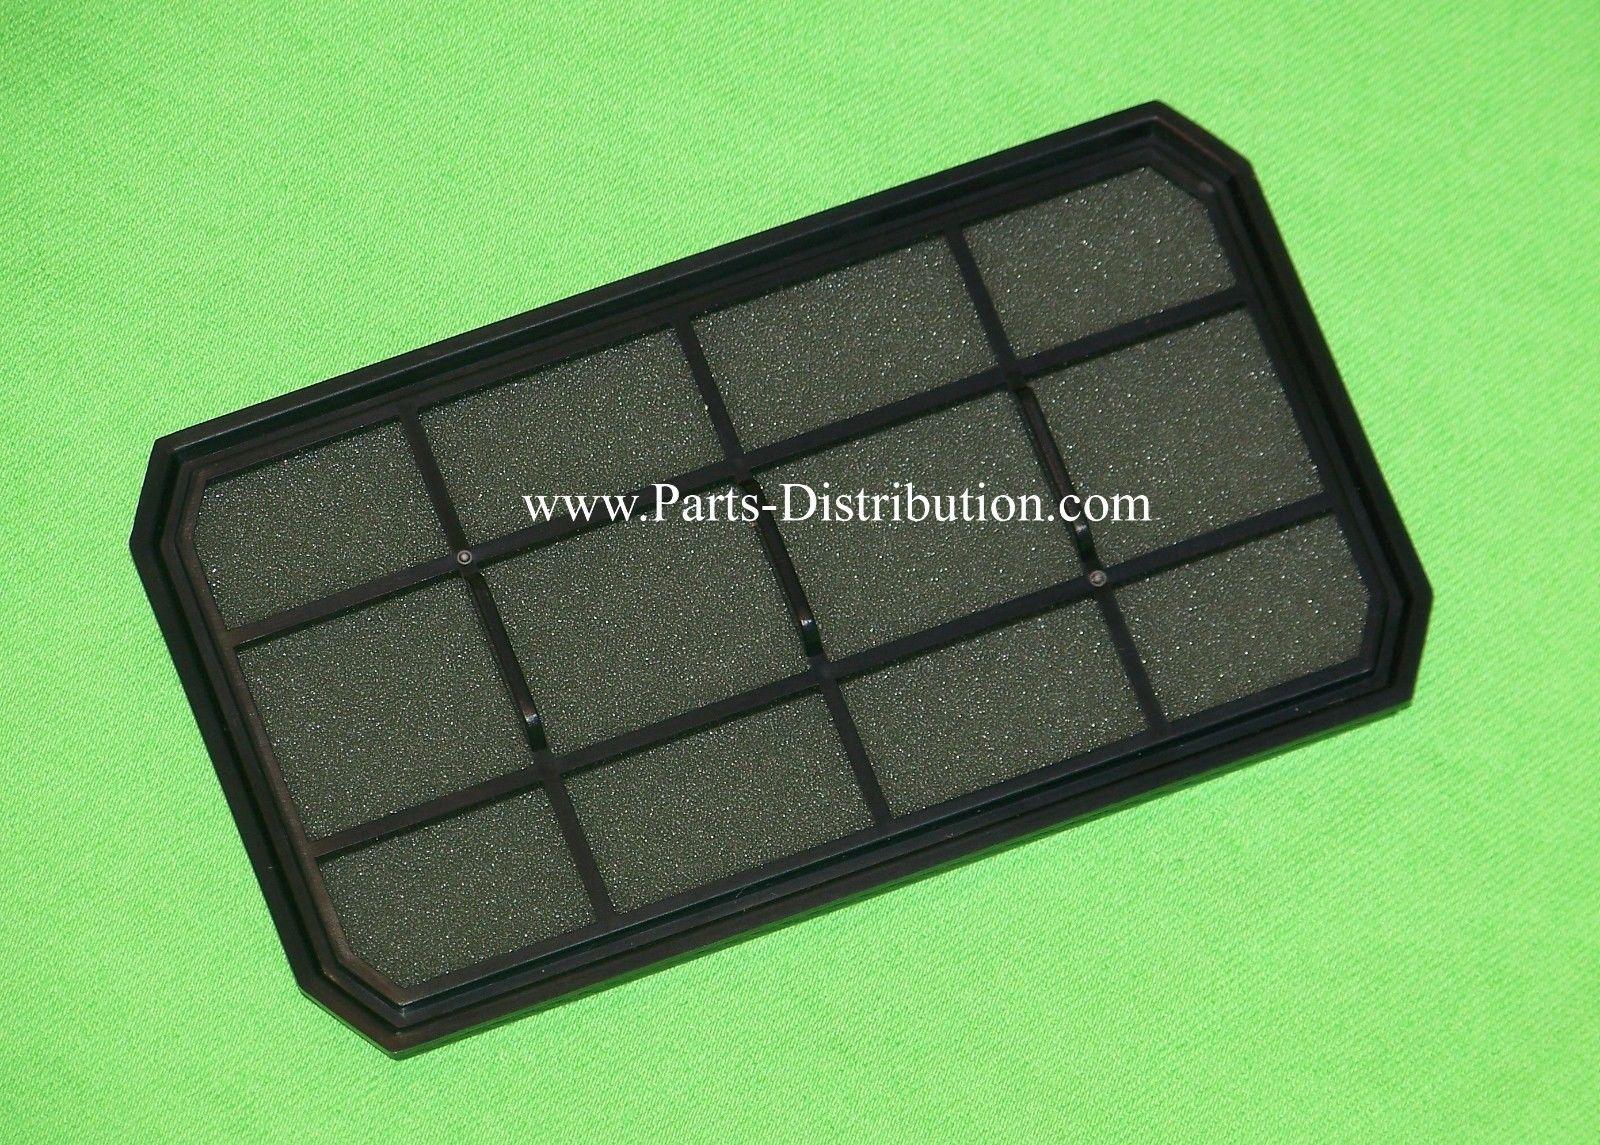 for EB 470 4 475Wi Epson ELPAF40 475W Air filter